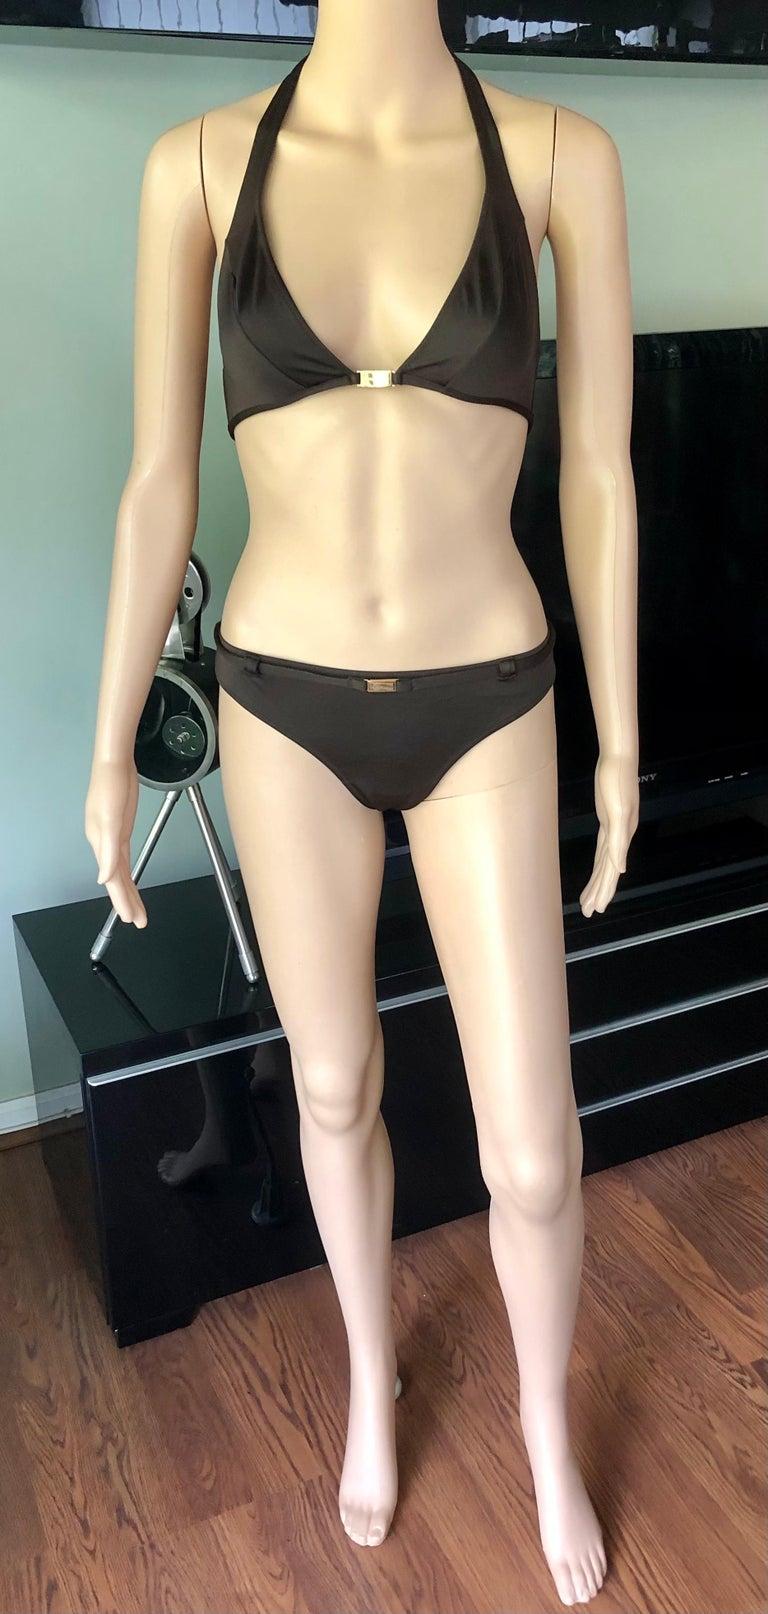 Women's Dolce & Gabbana Logo Embellished Belted Brown Bikini Swimwear Swimsuit 2 Piece For Sale